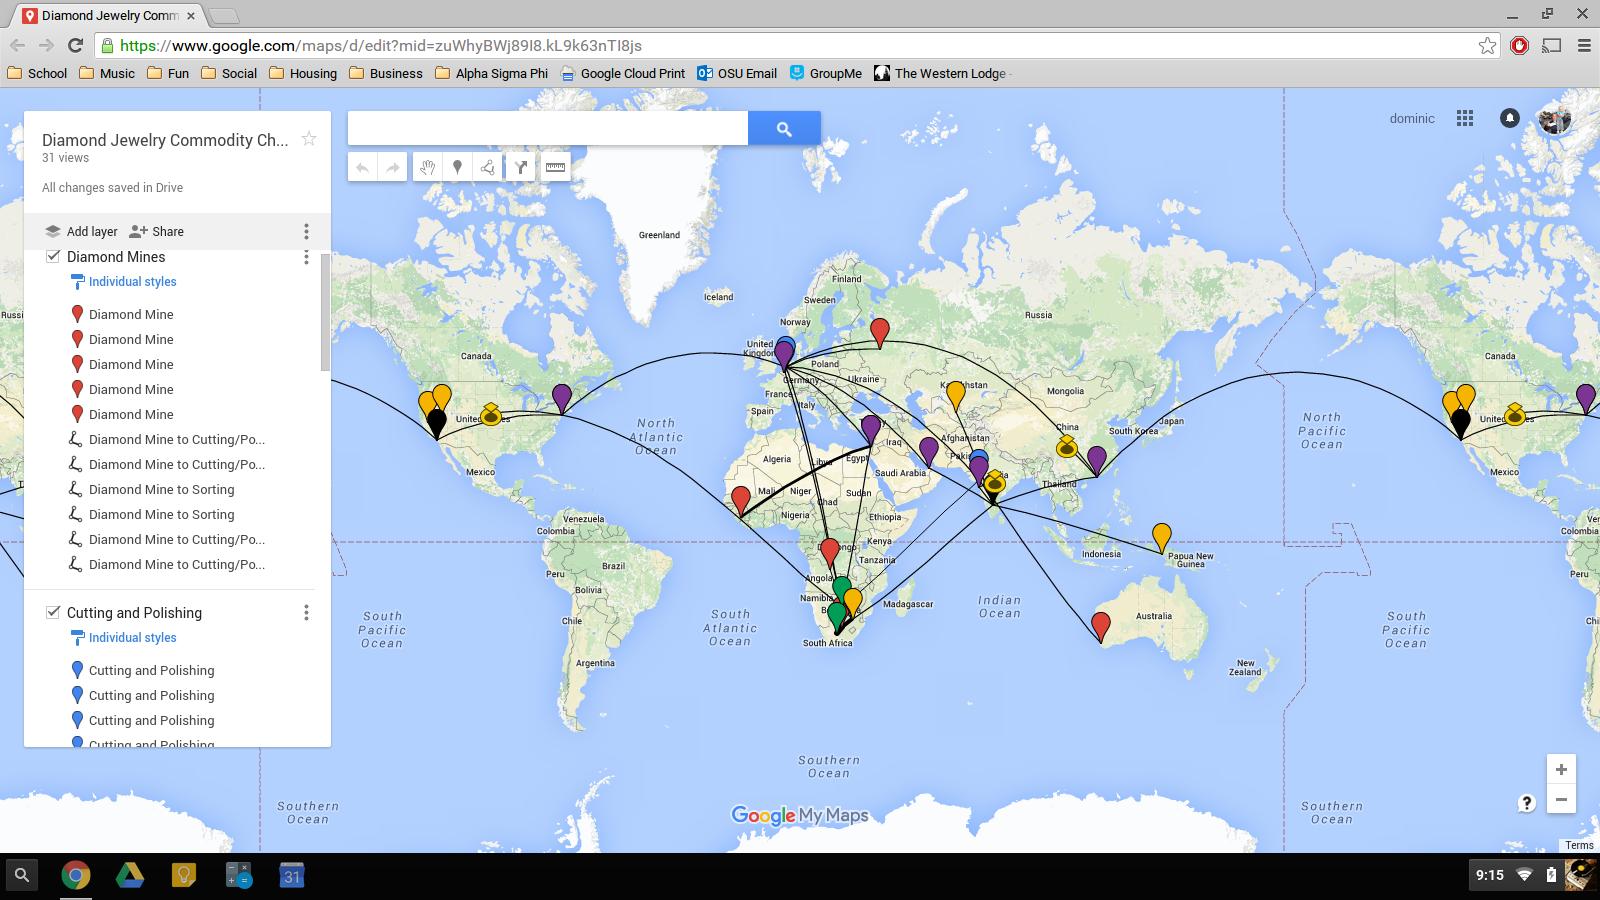 Screenshot 2015-12-08 at 9.15.36 PM - Display 1